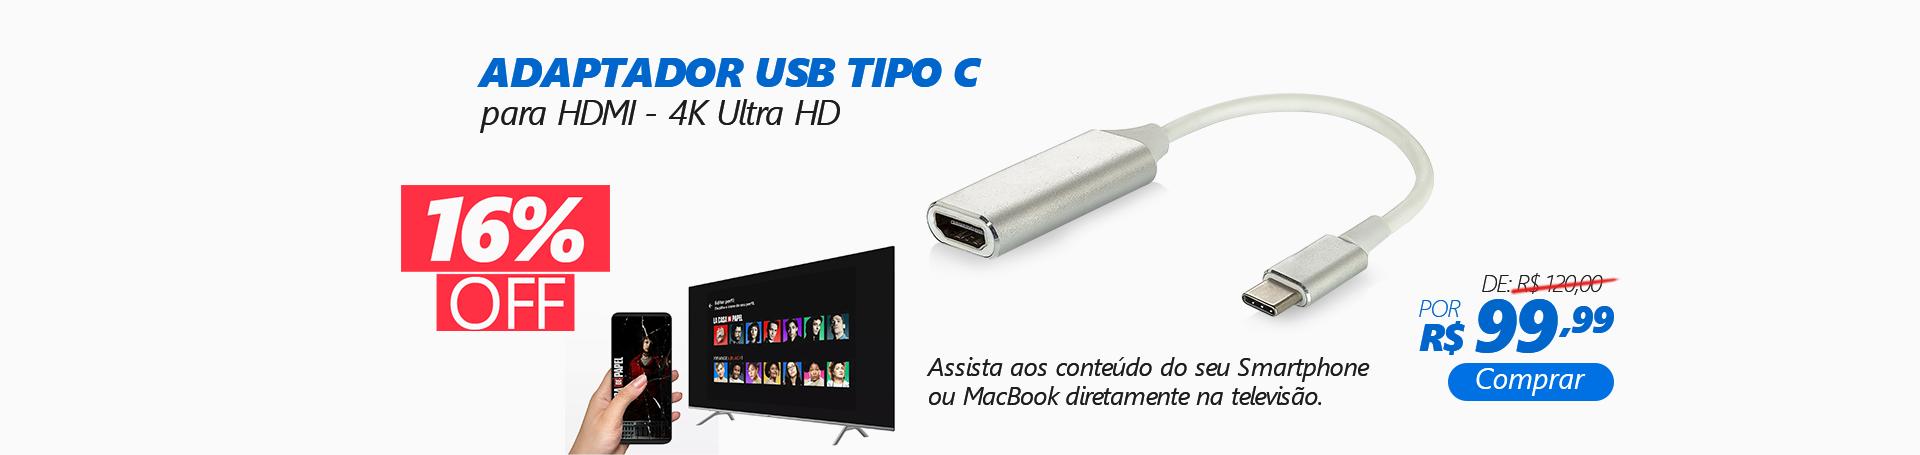 9534 - Adaptador USB Tipo C para HDMI 4k